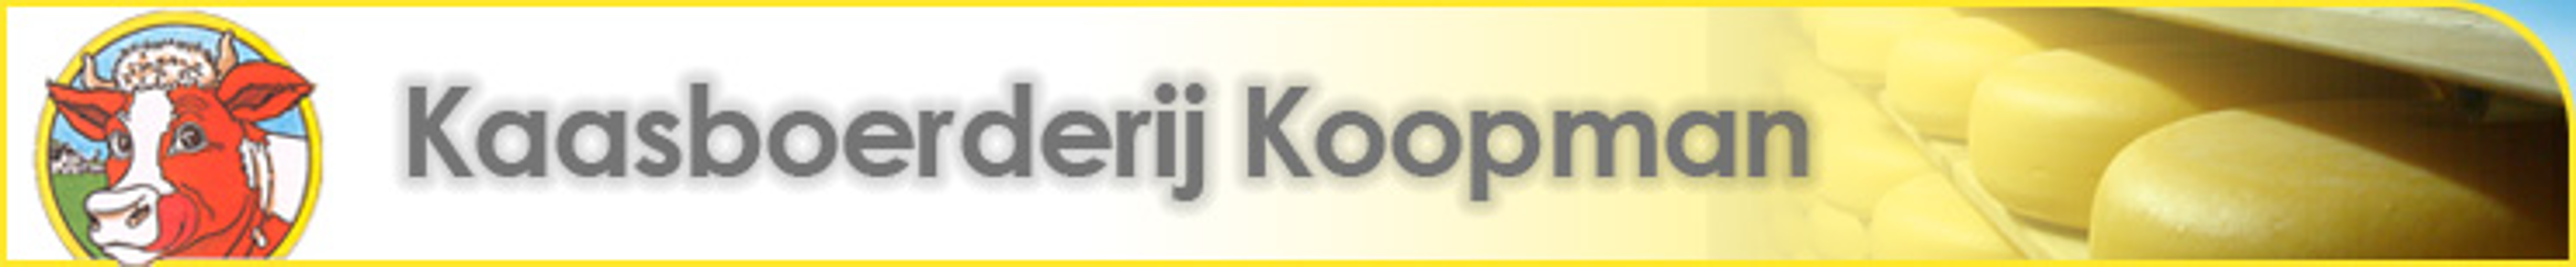 Kaasboerderij Koopman